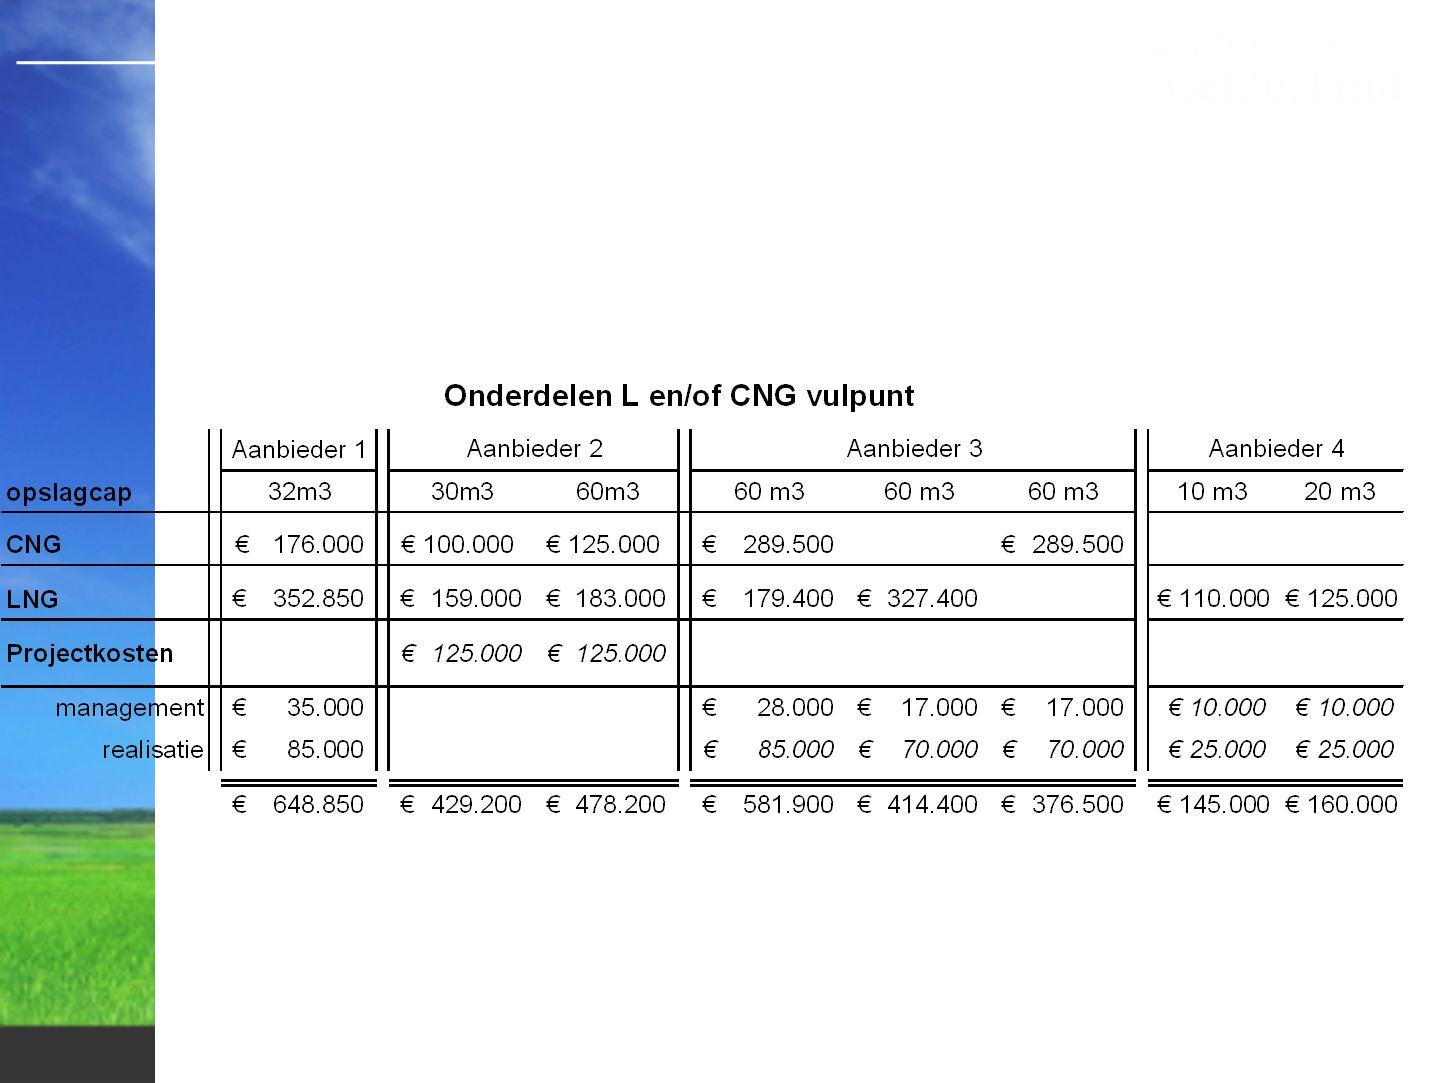 DIESELCNGLNGEENHEID AANSCHAFKOSTEN (ex btw)75.000120.000135.000€ AANSCHAFSUBSIDIE000€ AANSCHAFKOSTEN (in btw)89.250142.800160.650€ SUBSIDIE000€ RESTWAARDE12,5%0% % VERZEKERING (v/d aanschaf)3,5% AFSCRIJVINGSPER.8jr VERBRUIK40,00ltr40,00kg33,00kg..